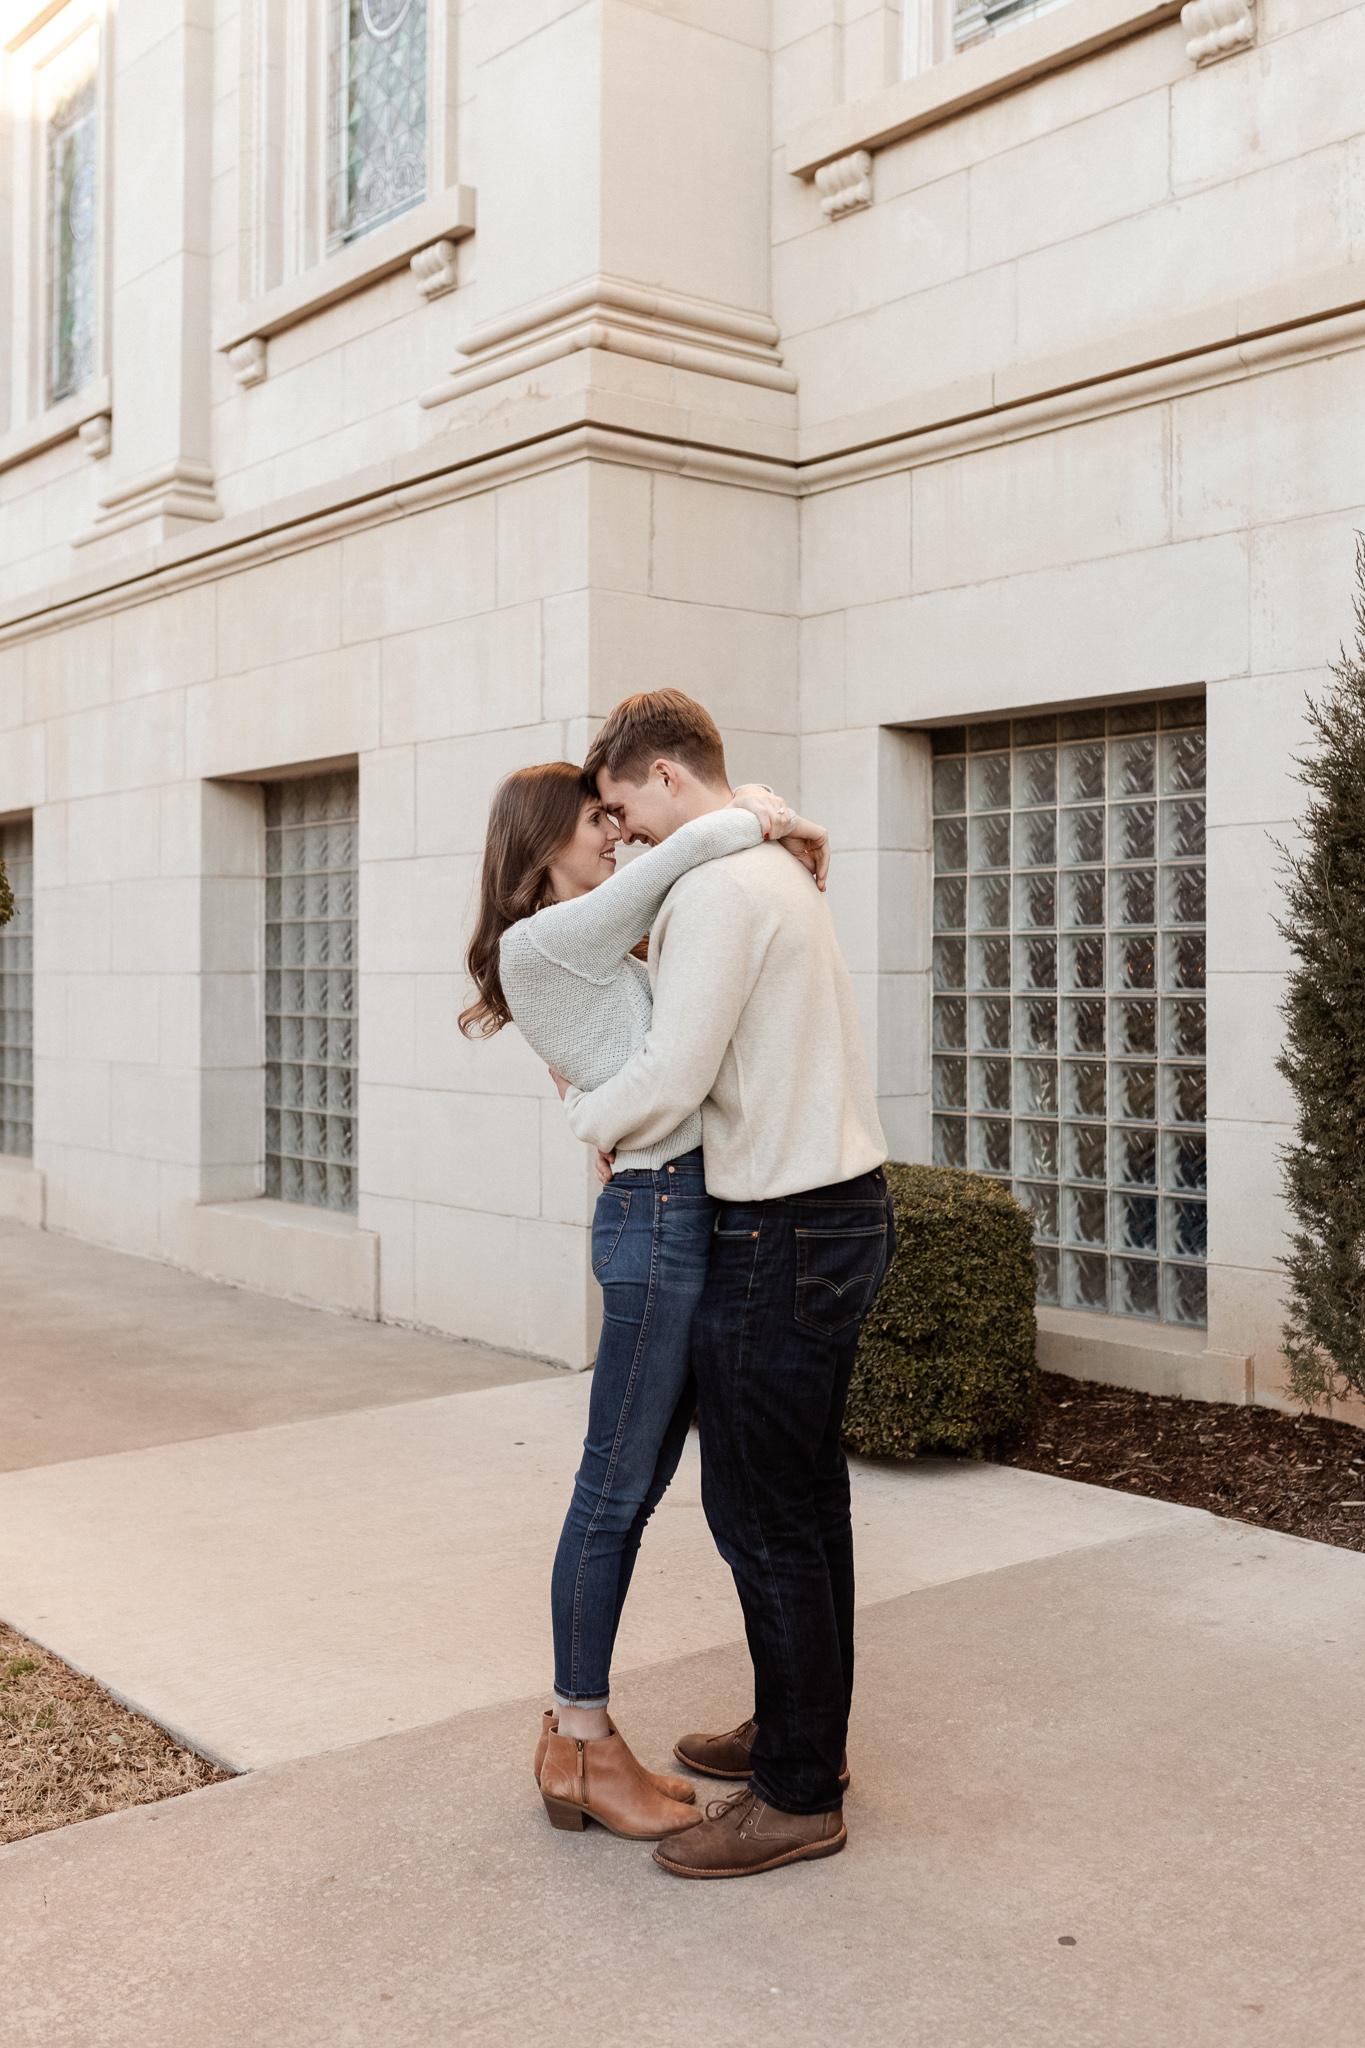 Browne | Timeless Downtown Engagements | Oklahoma Wedding Photographer-25.jpg